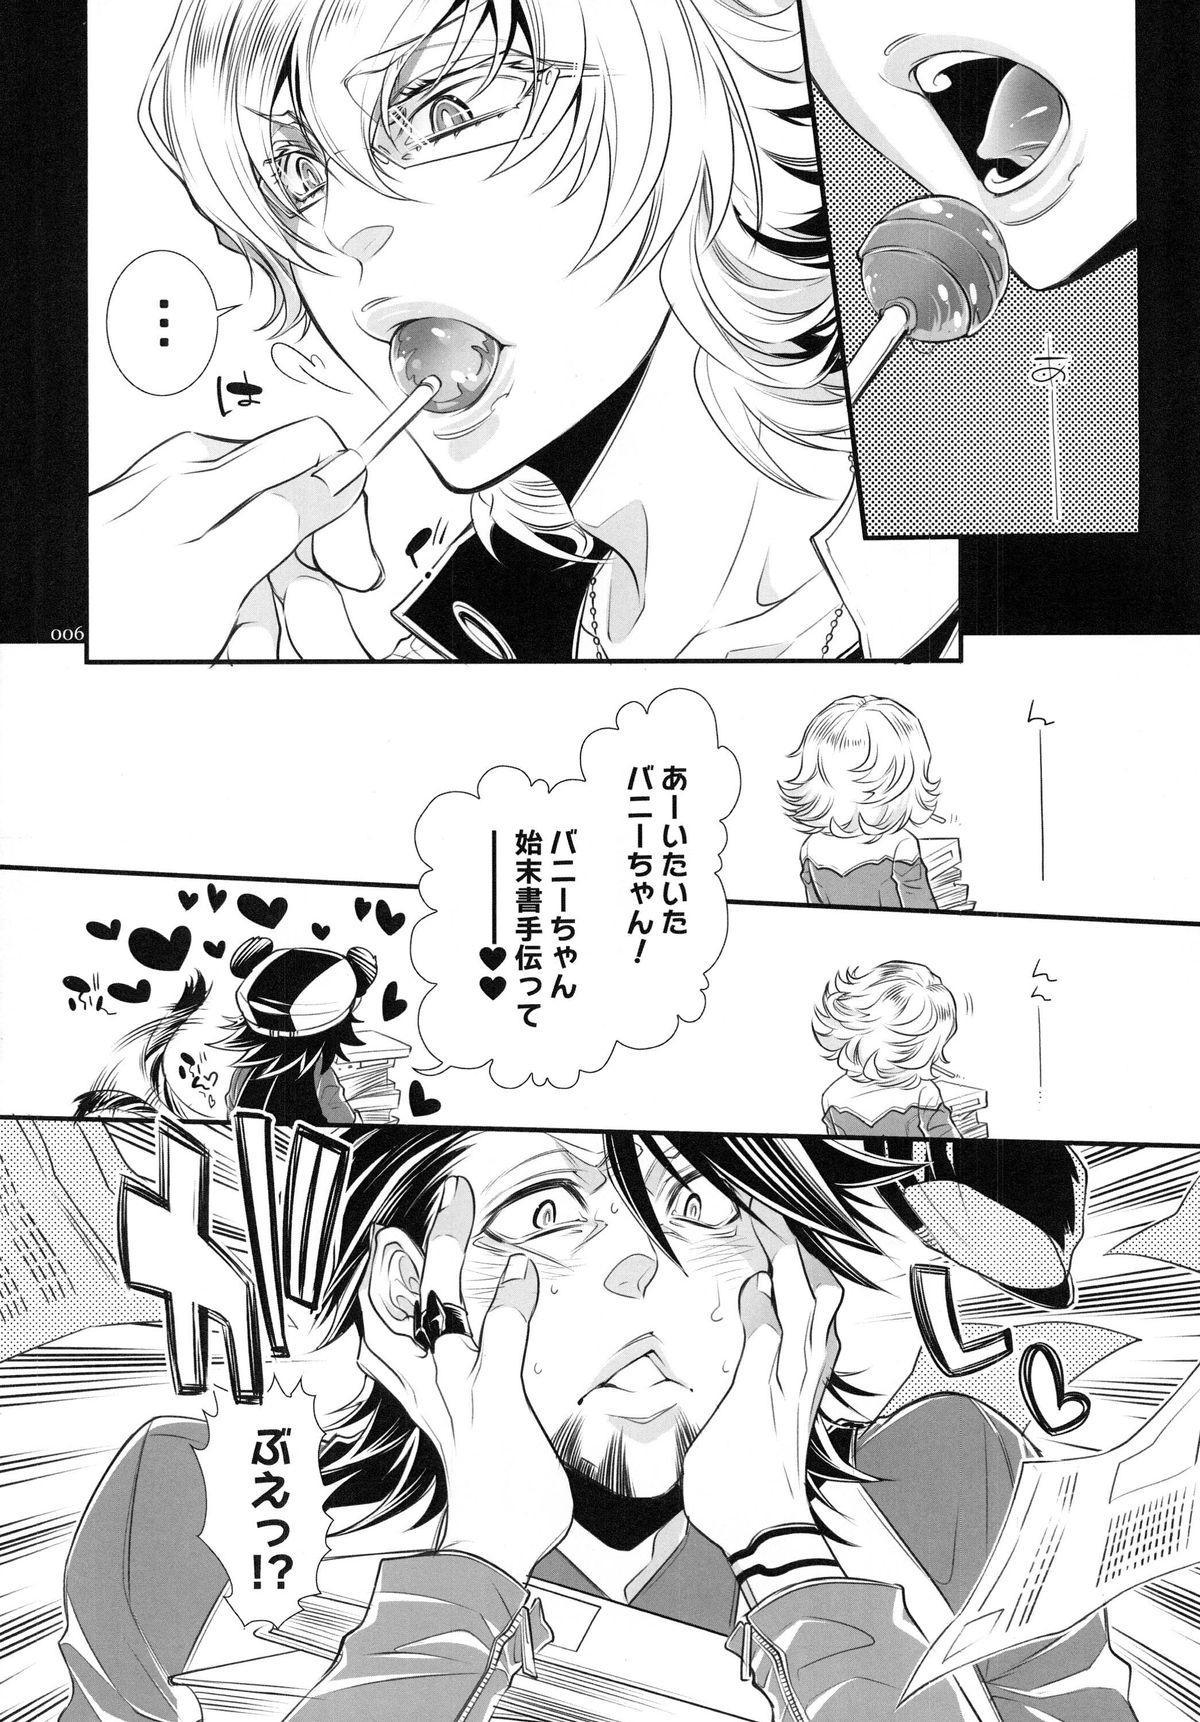 Bunny-chan to Iikoto Shiyokka 5